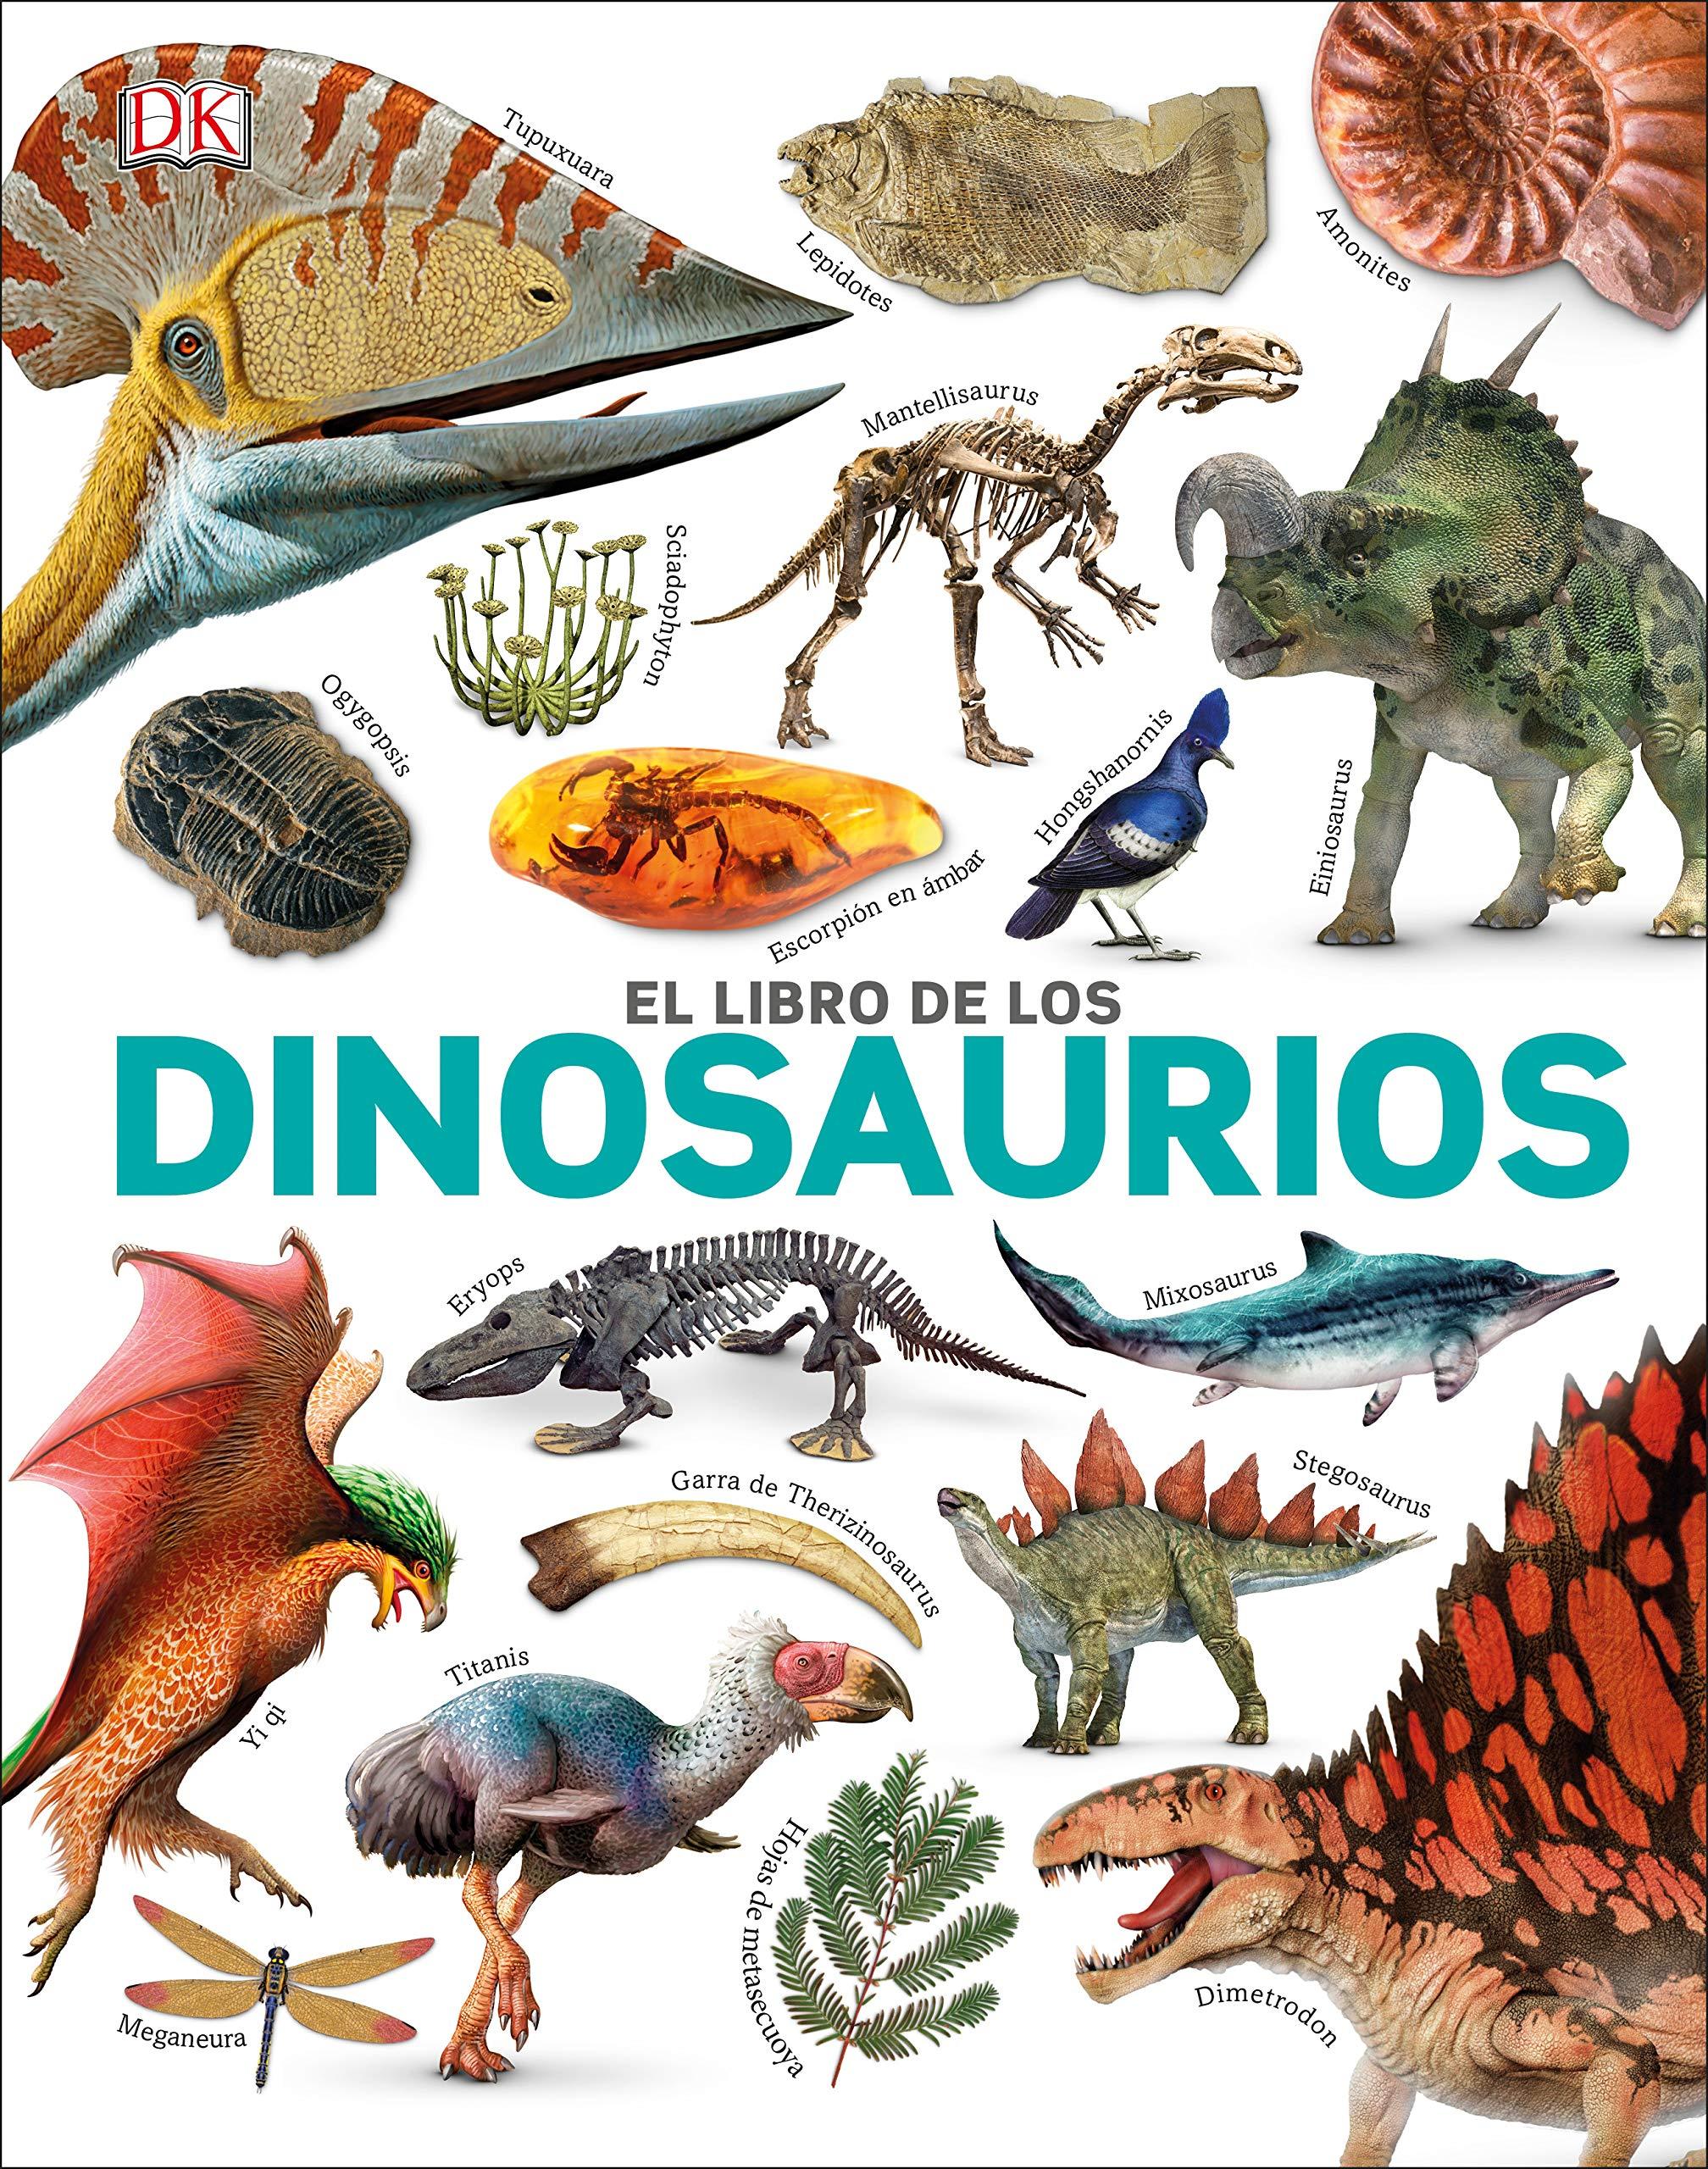 Smithsonian: The Dinosaur Book (Spanish Language Edition) (Spanish Edition) by DK Children